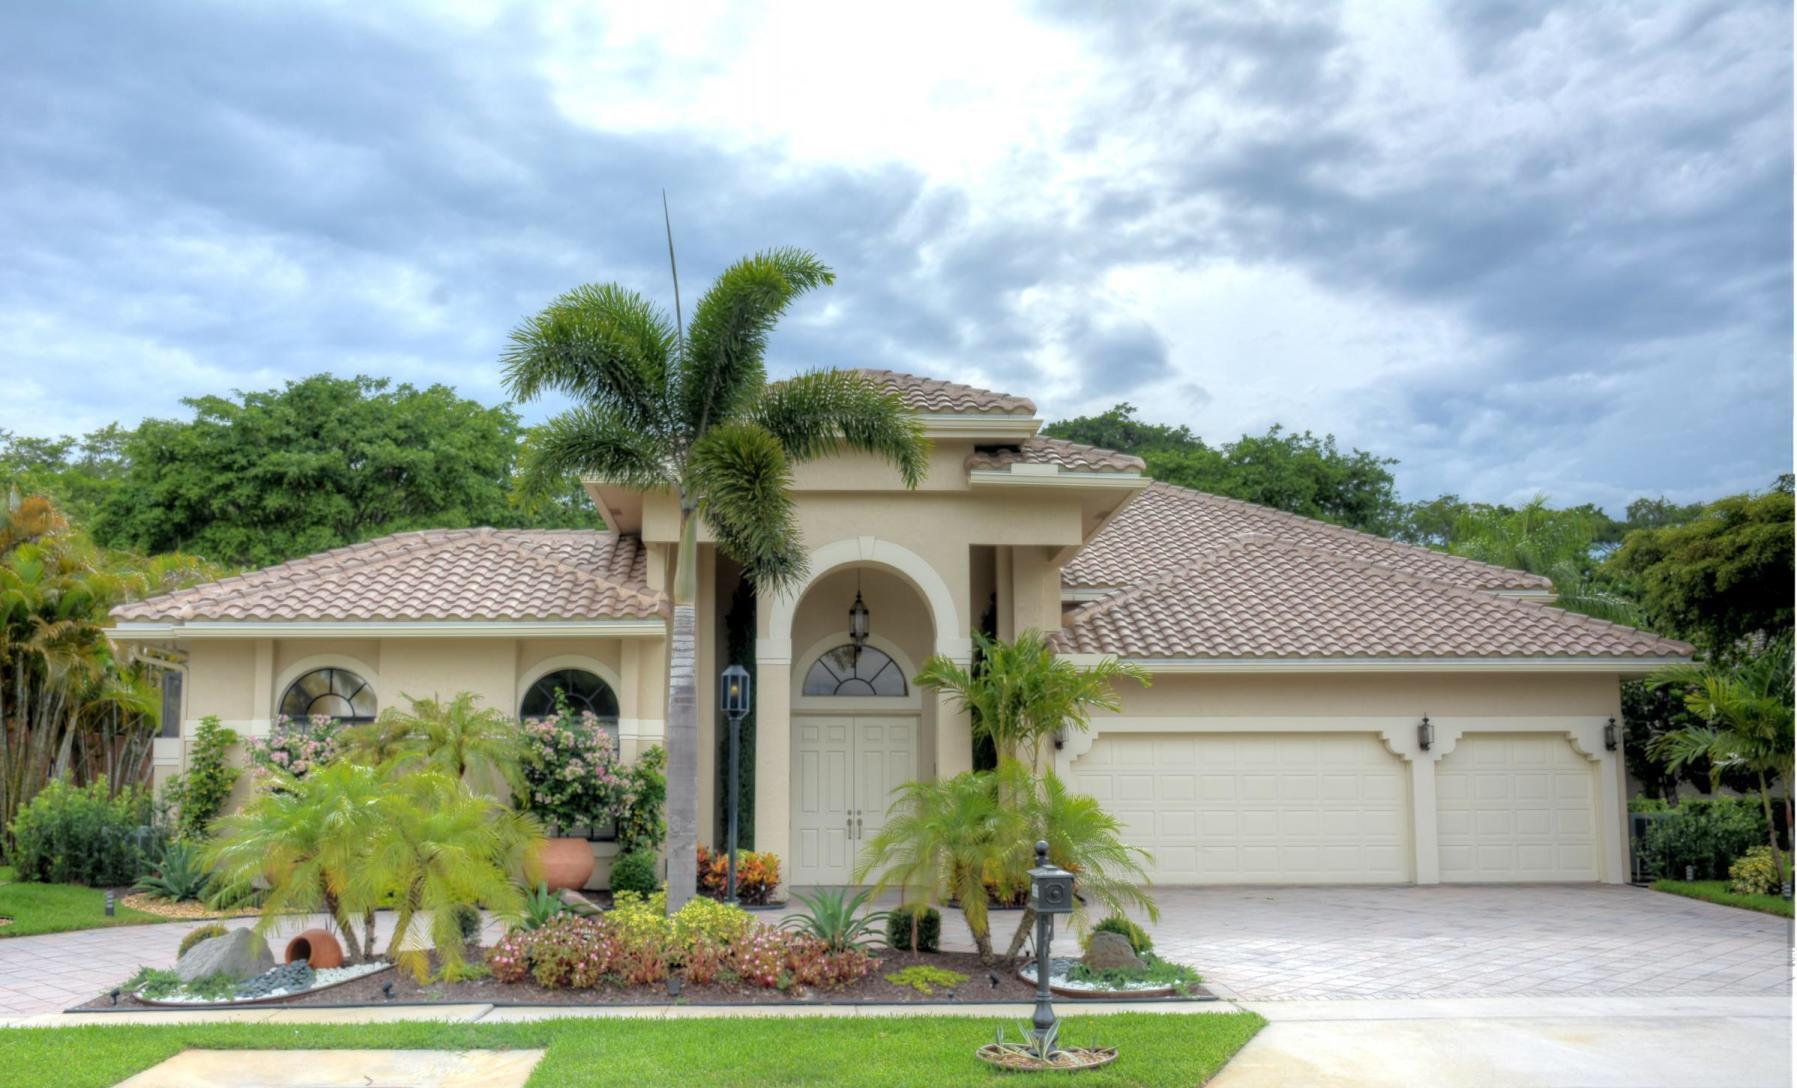 Photo of 10586 Stonebridge Boulevard, Boca Raton, FL 33498